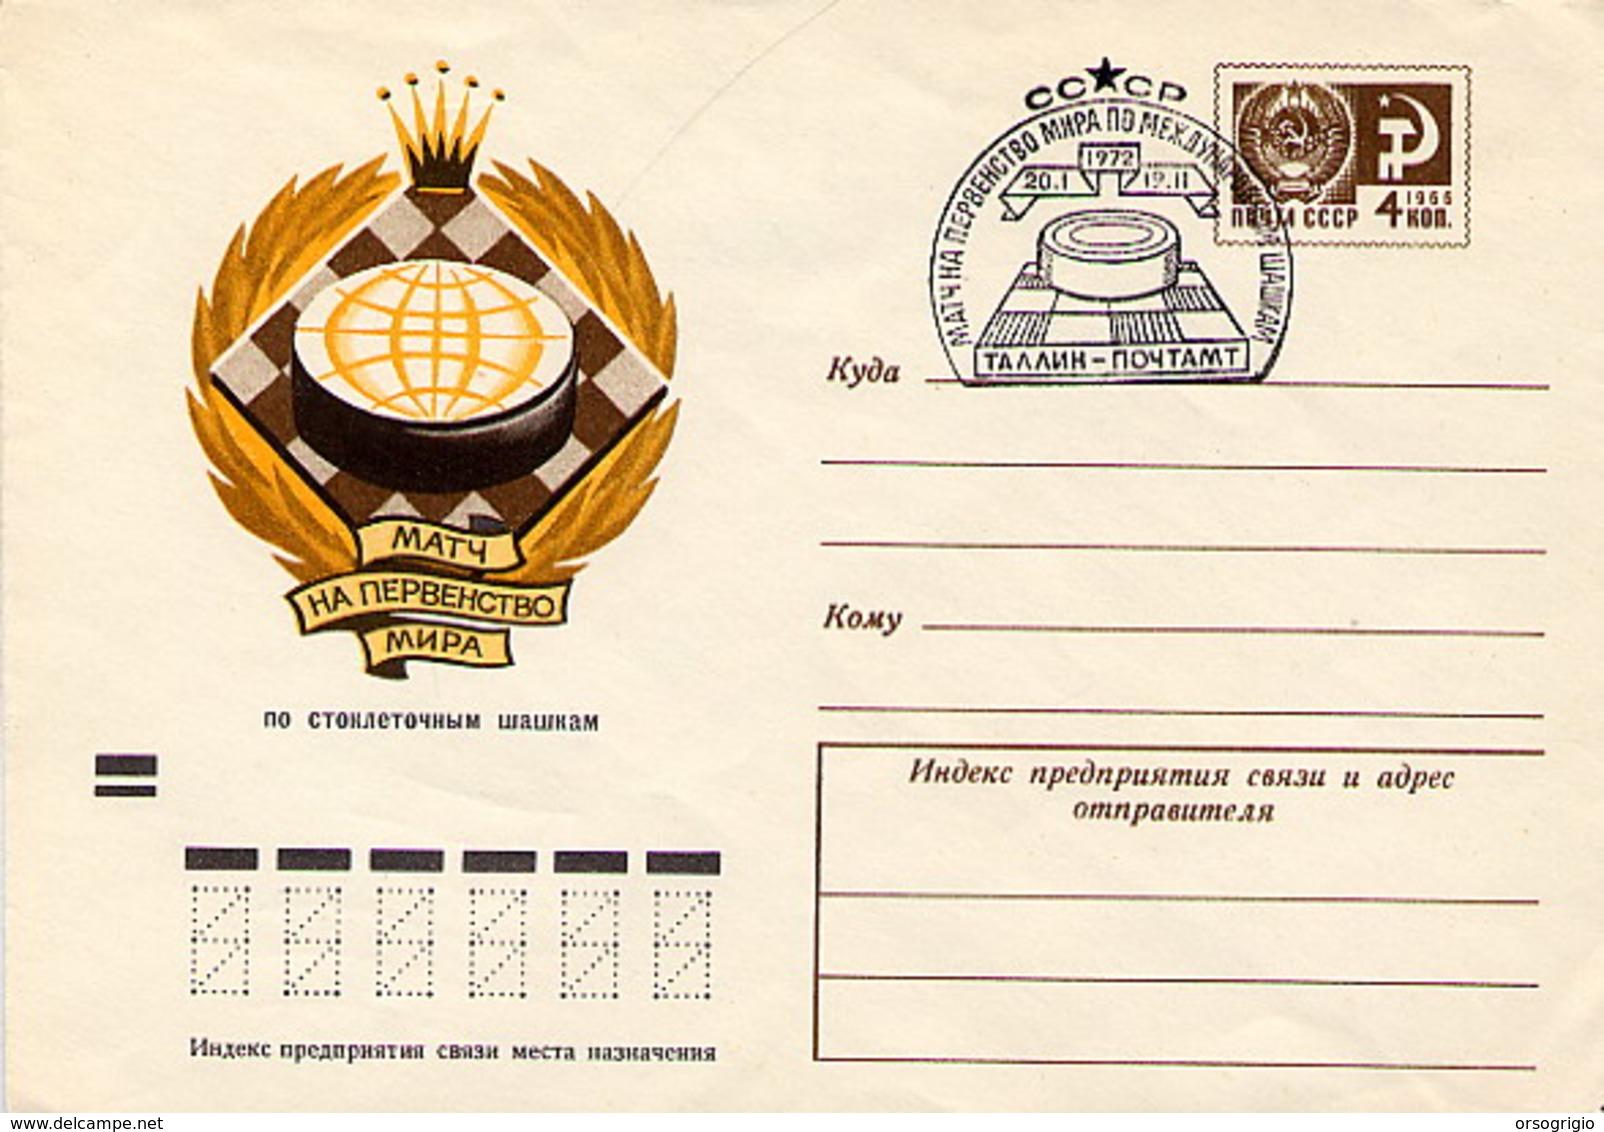 RUSSIA - INTERO POSTALE - 1972  - SCHAFT - SZACHOWY - SCACCHI -  CHESS - DAMA  SCACCHIERA - Scacchi